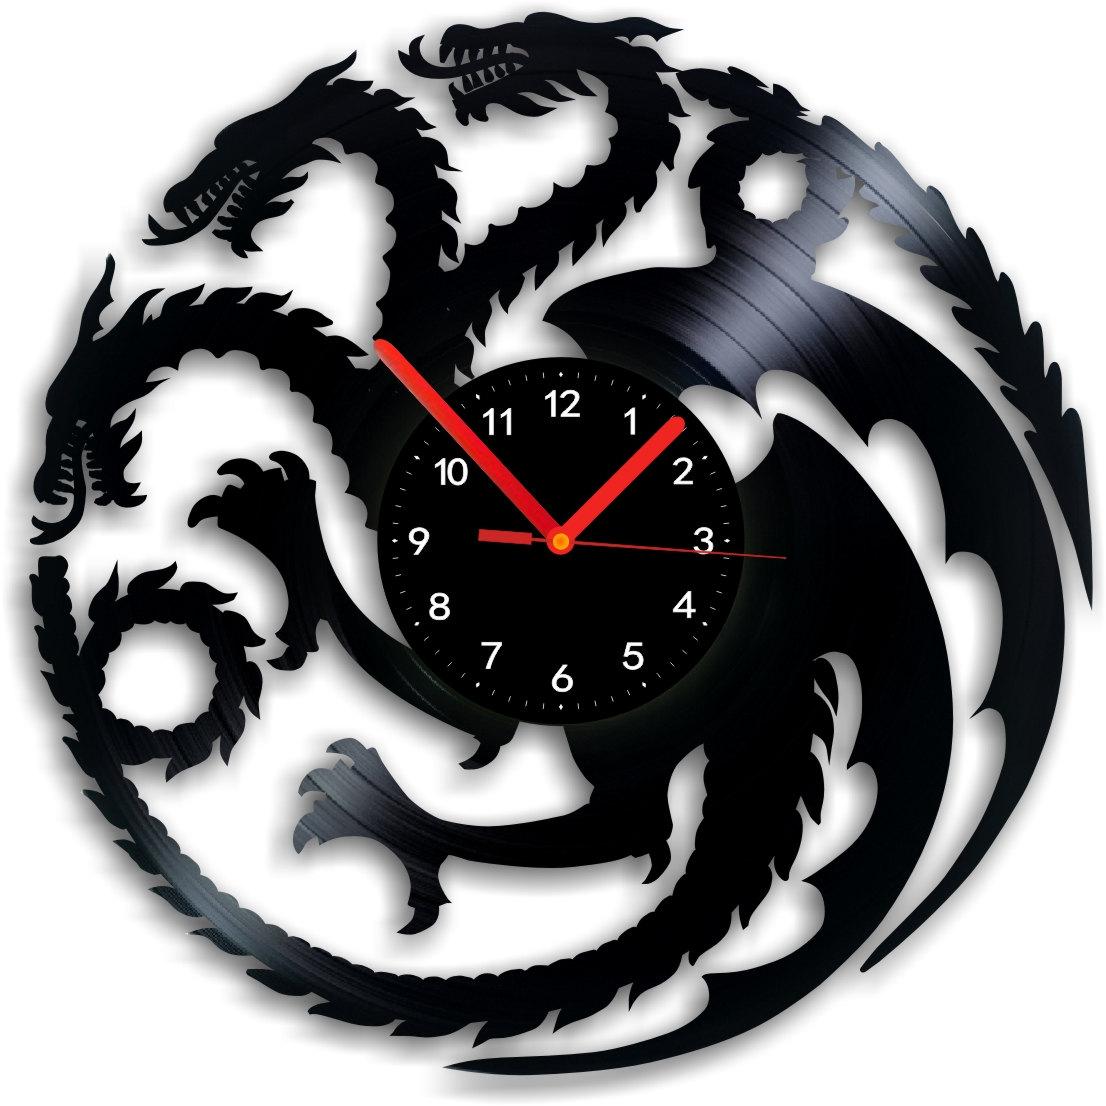 Vinyl Clock Game Of The Thrones Dragons Indigovento